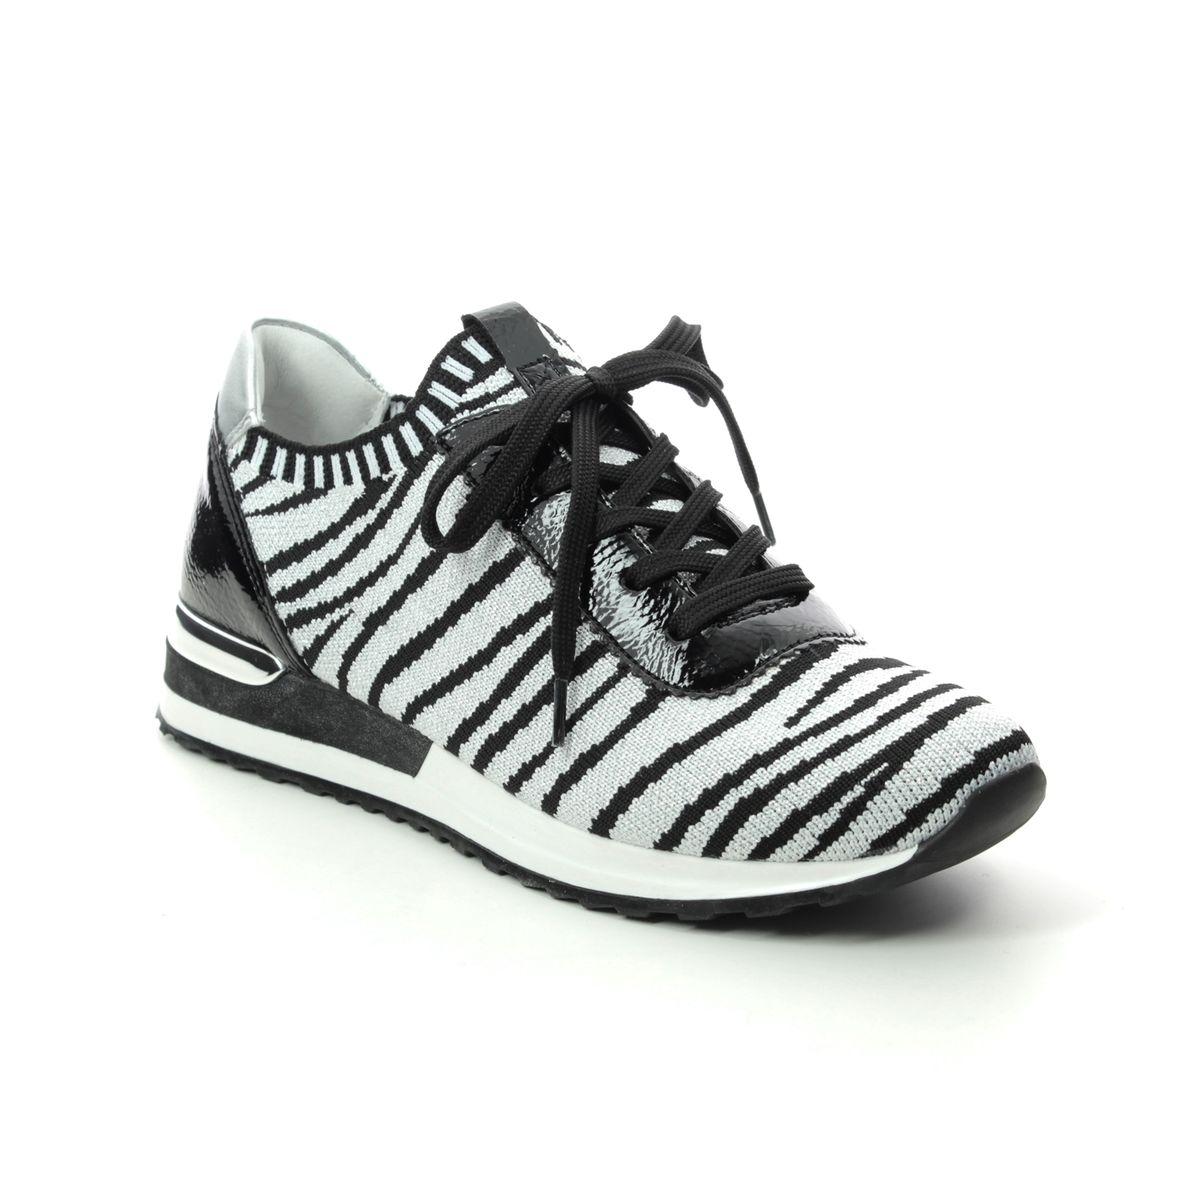 Remonte Vapoz R2508-90 Zebra print trainers